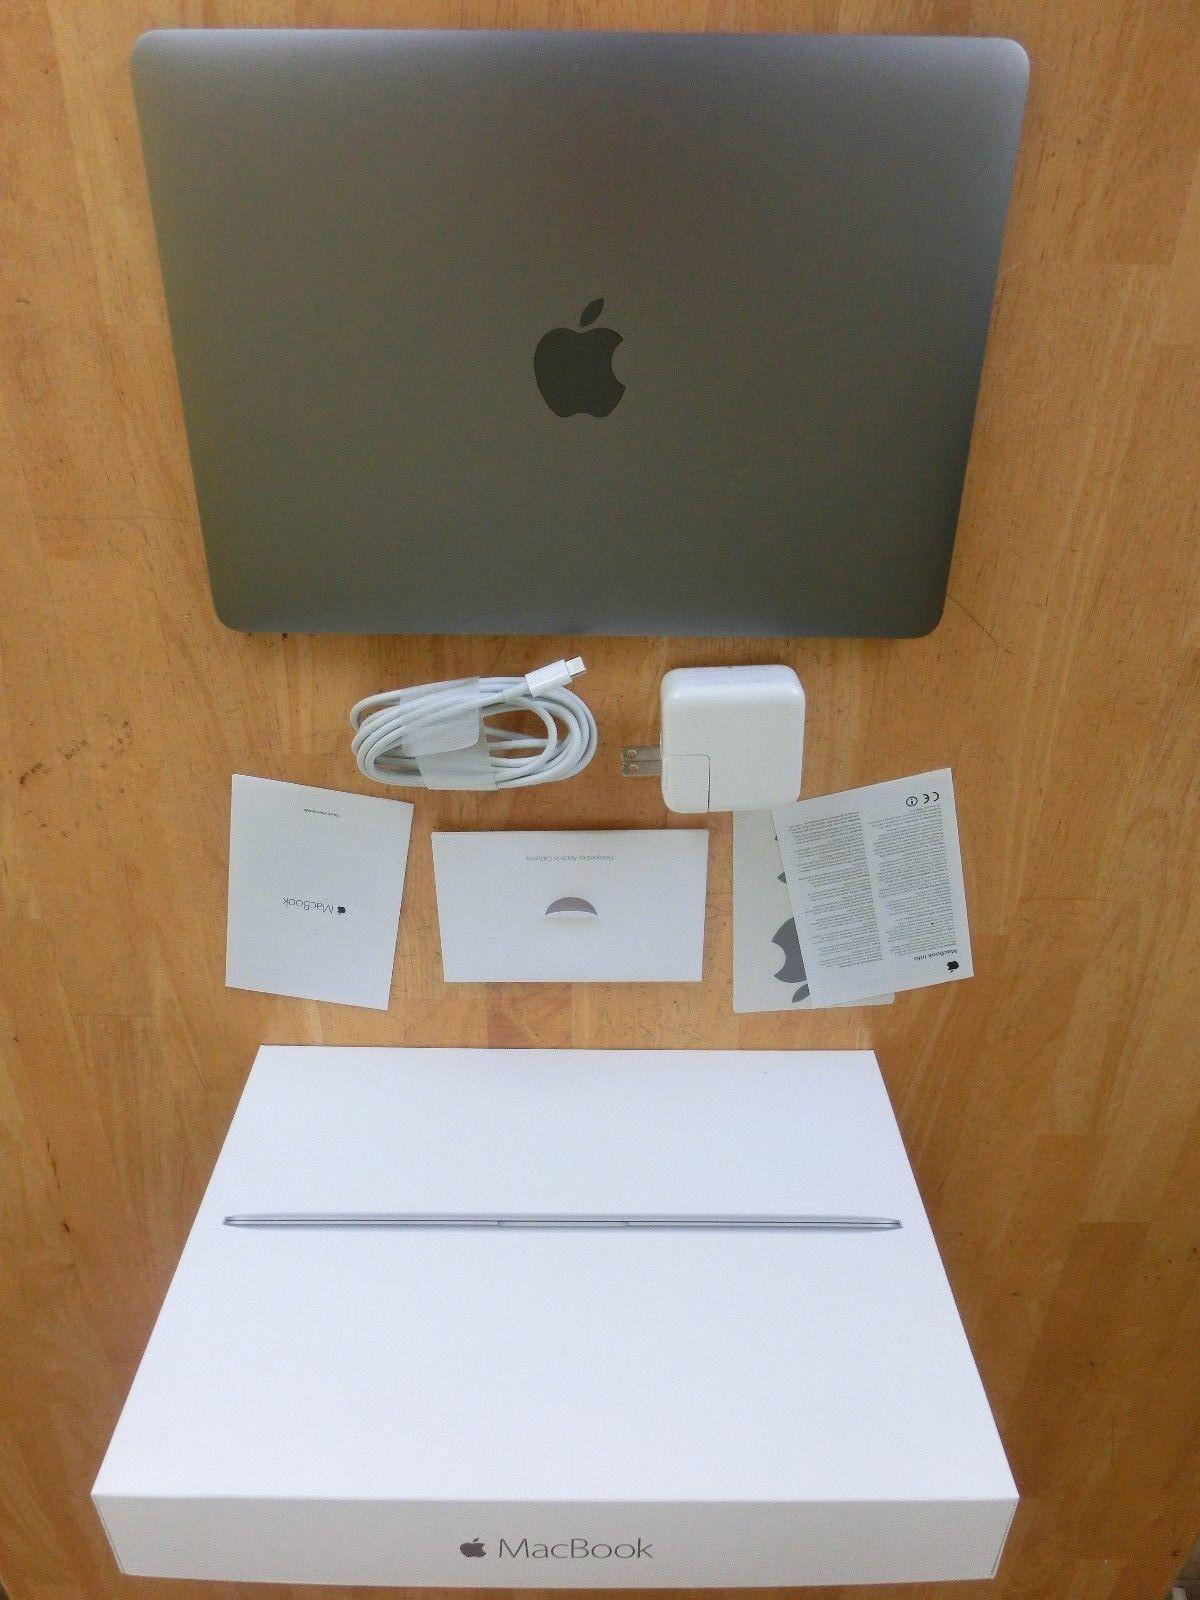 Refurbished Macbook Air Refurbished Electronics Wholesale Distributors Shopping Website Http Www Usao Macbook Air Price Macbook 12 Inch Refurbished Macbook